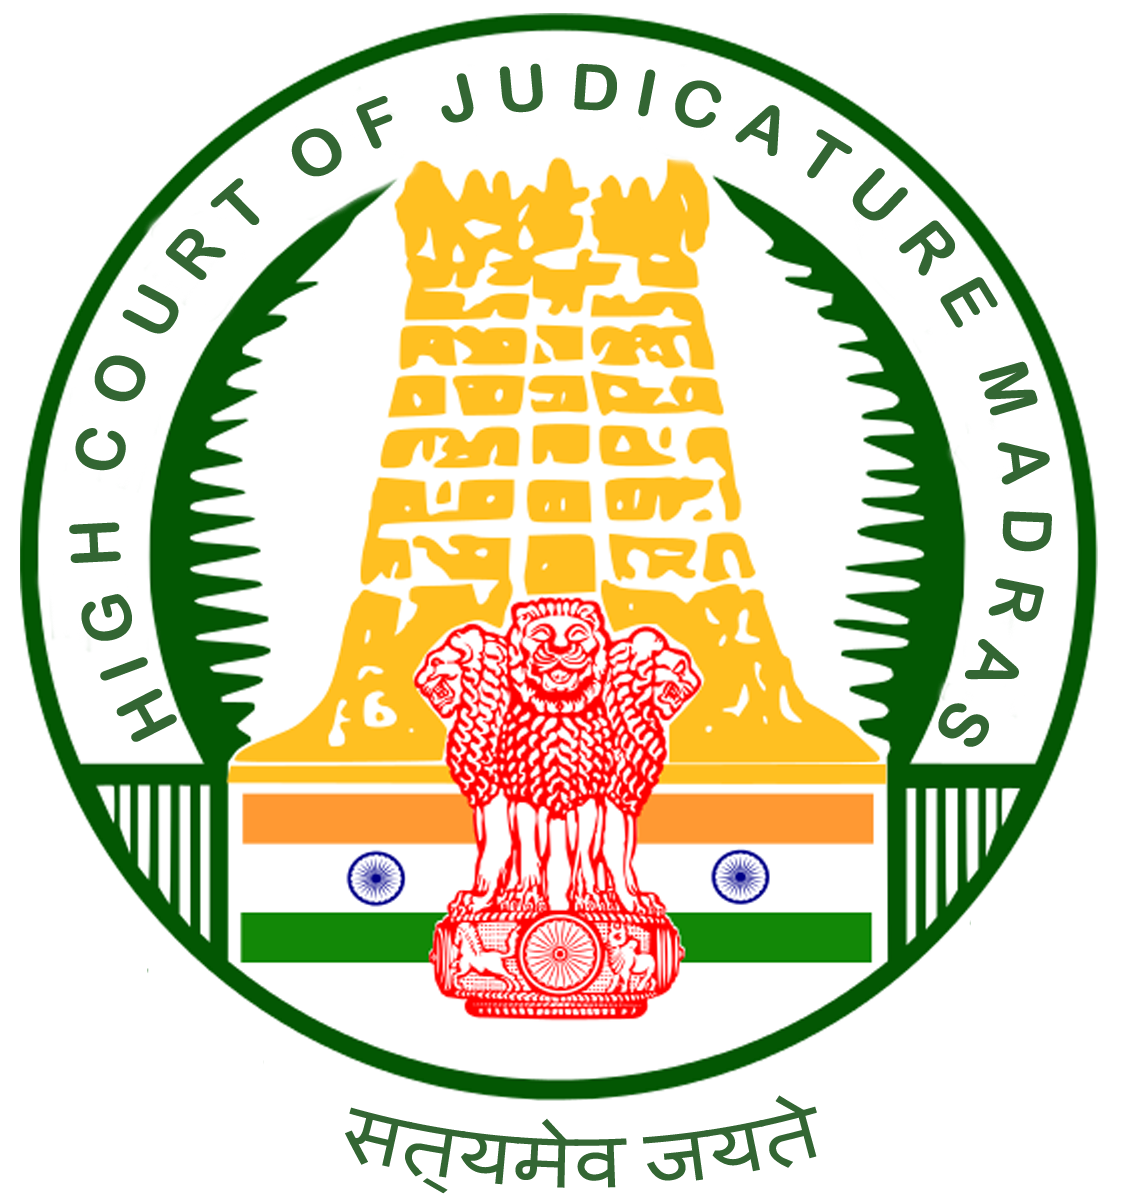 Madras High court announced results for Personal Assistant posts 2021| மெட்ராஸ் உயர் நீதிமன்றம் தனி உதவியாளர் பதவிகளுக்கான முடிவுகள் 2021 | |_40.1